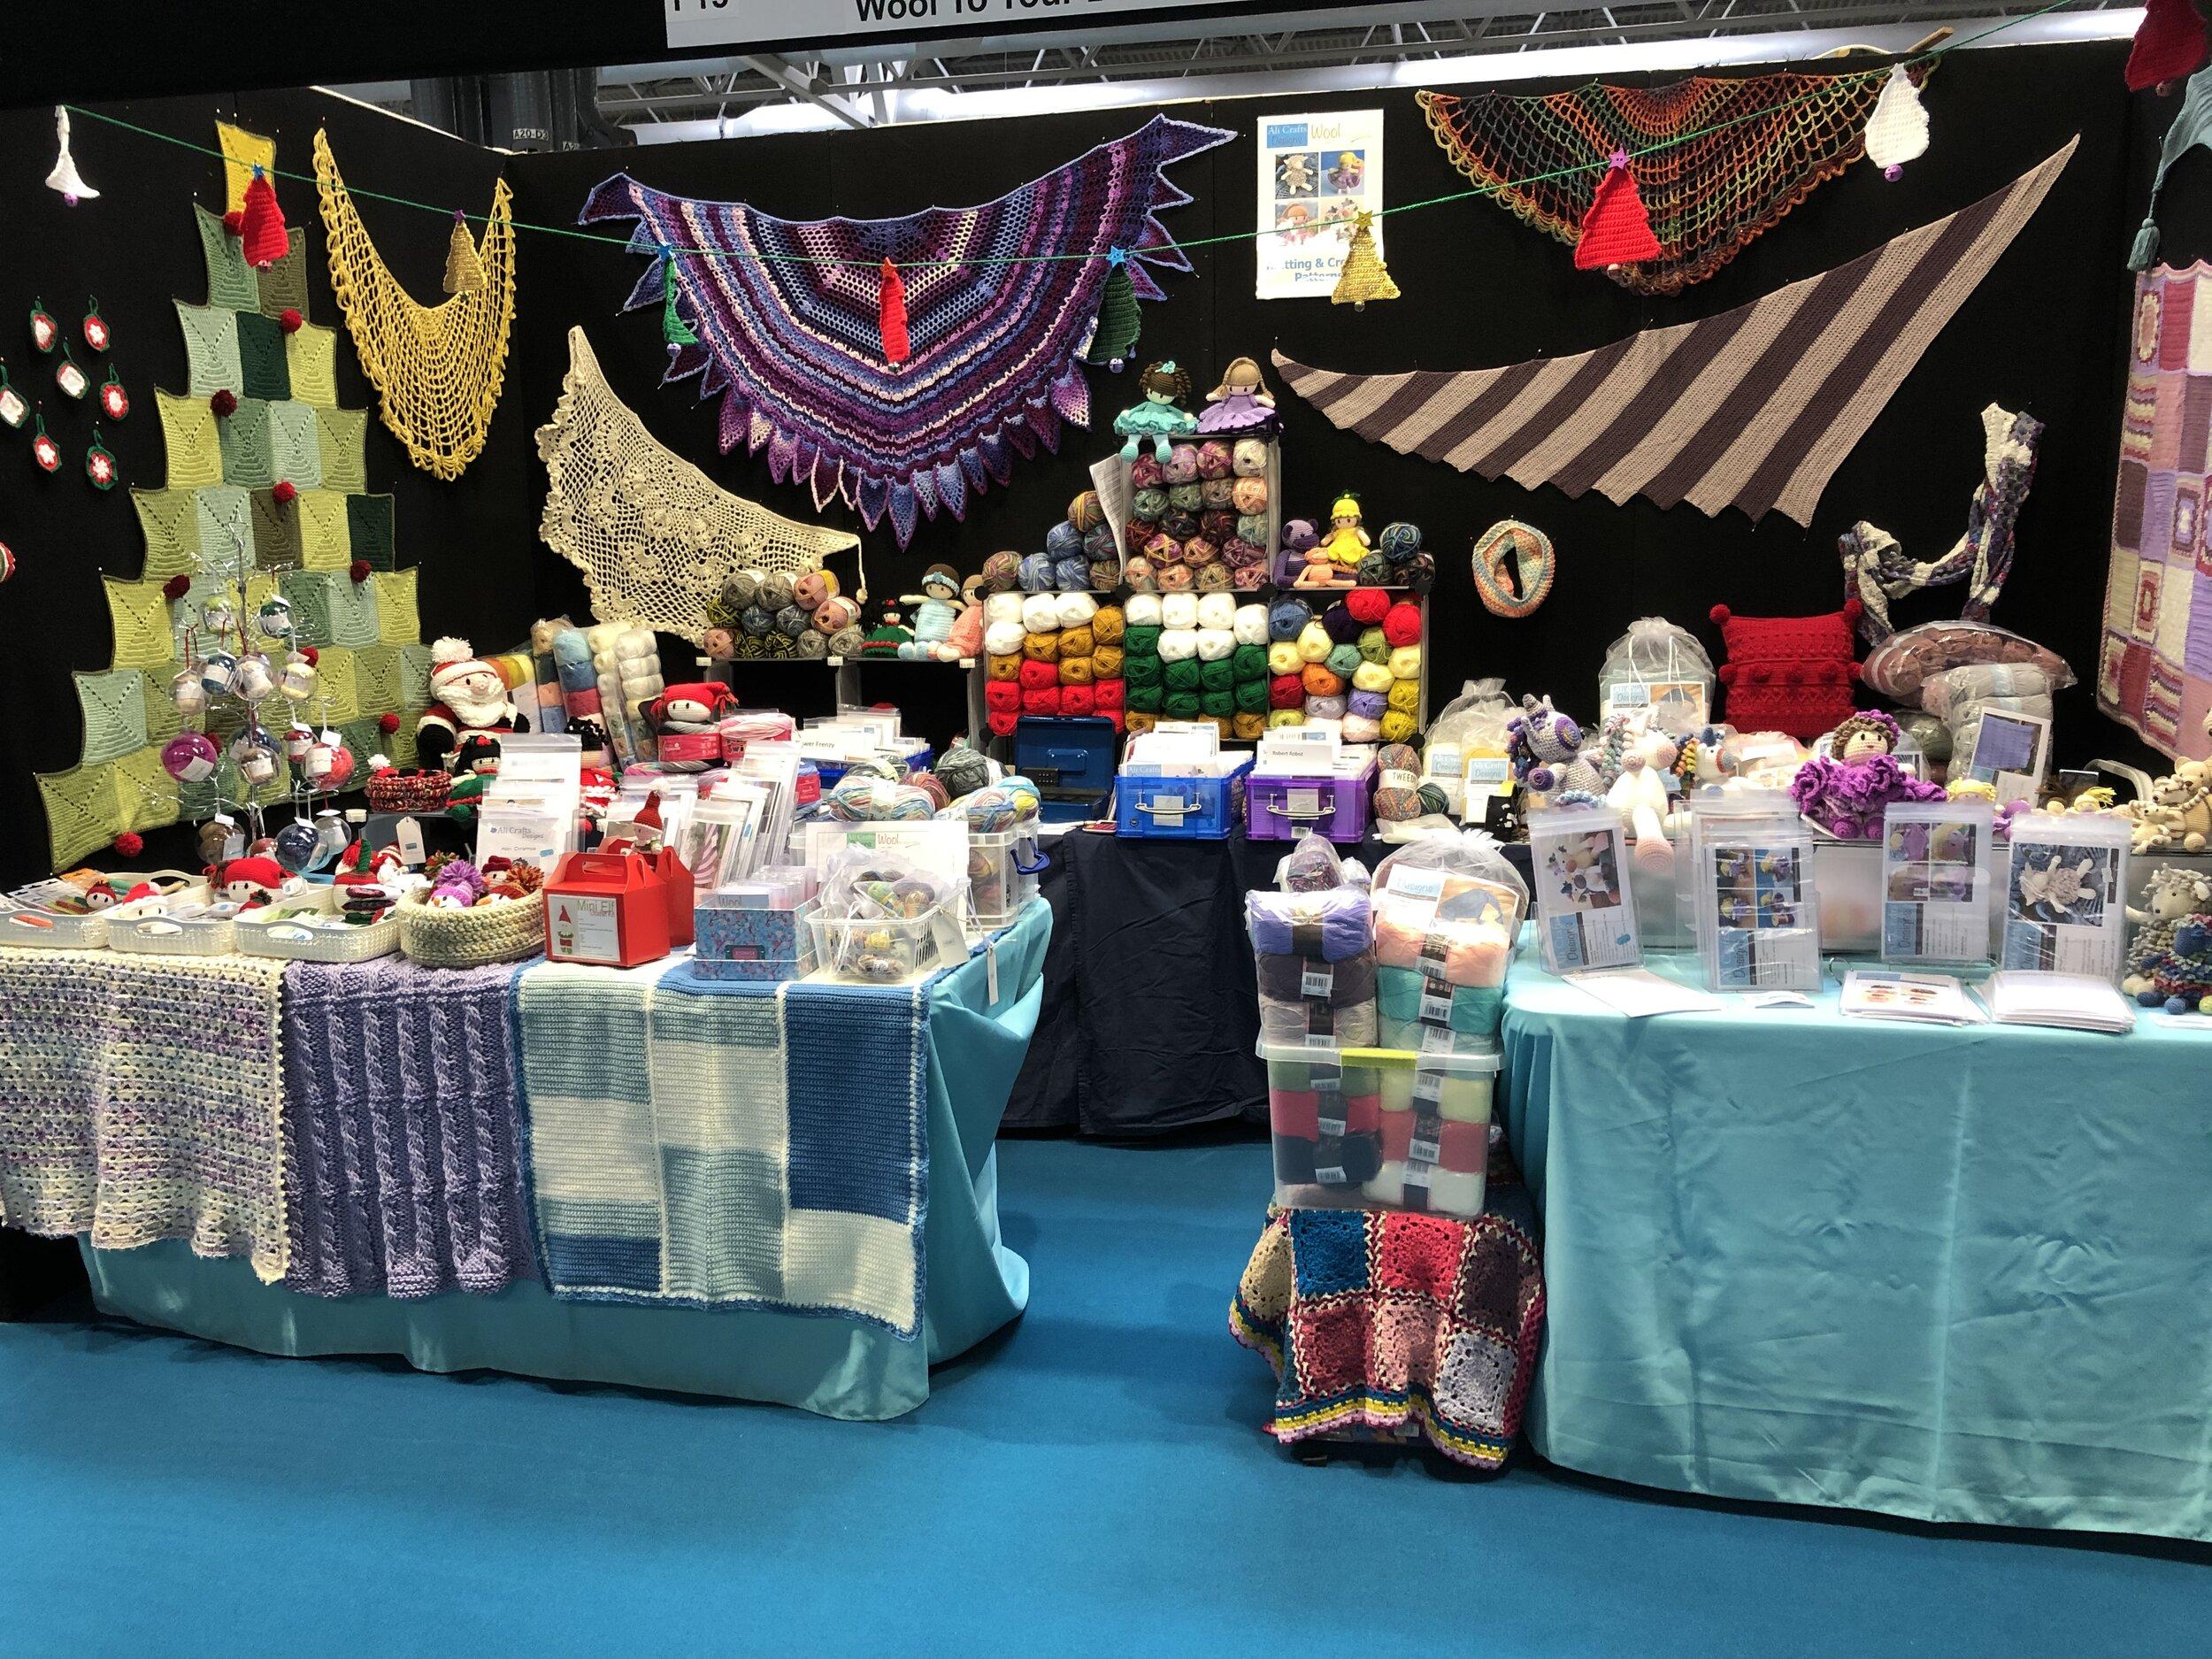 Crochet at the Birmingham NEC - Kits, patterns and yarn.